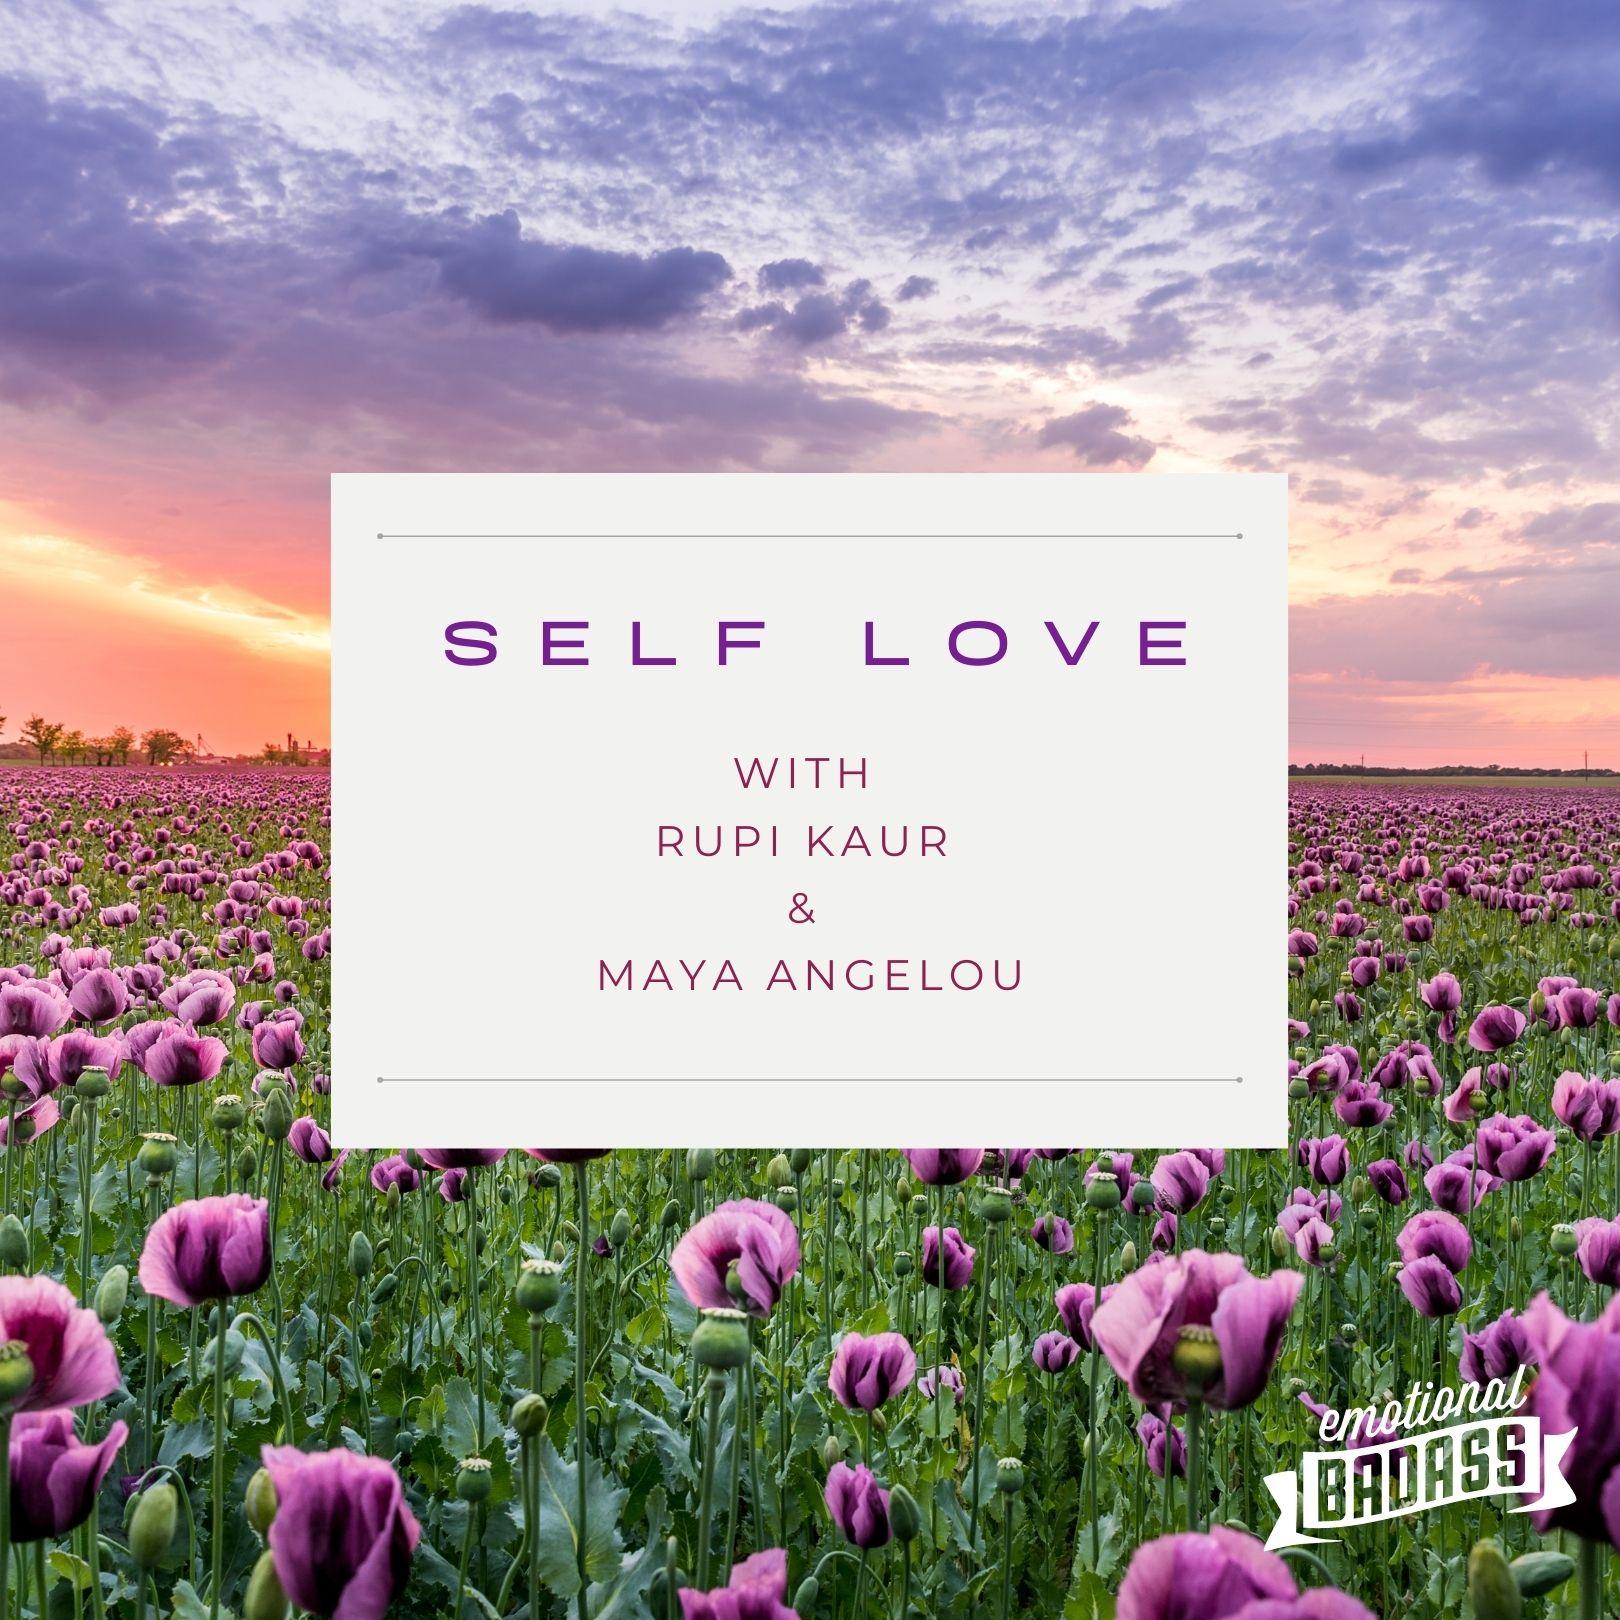 Self Love with Rupi Kaur and Maya Angelou